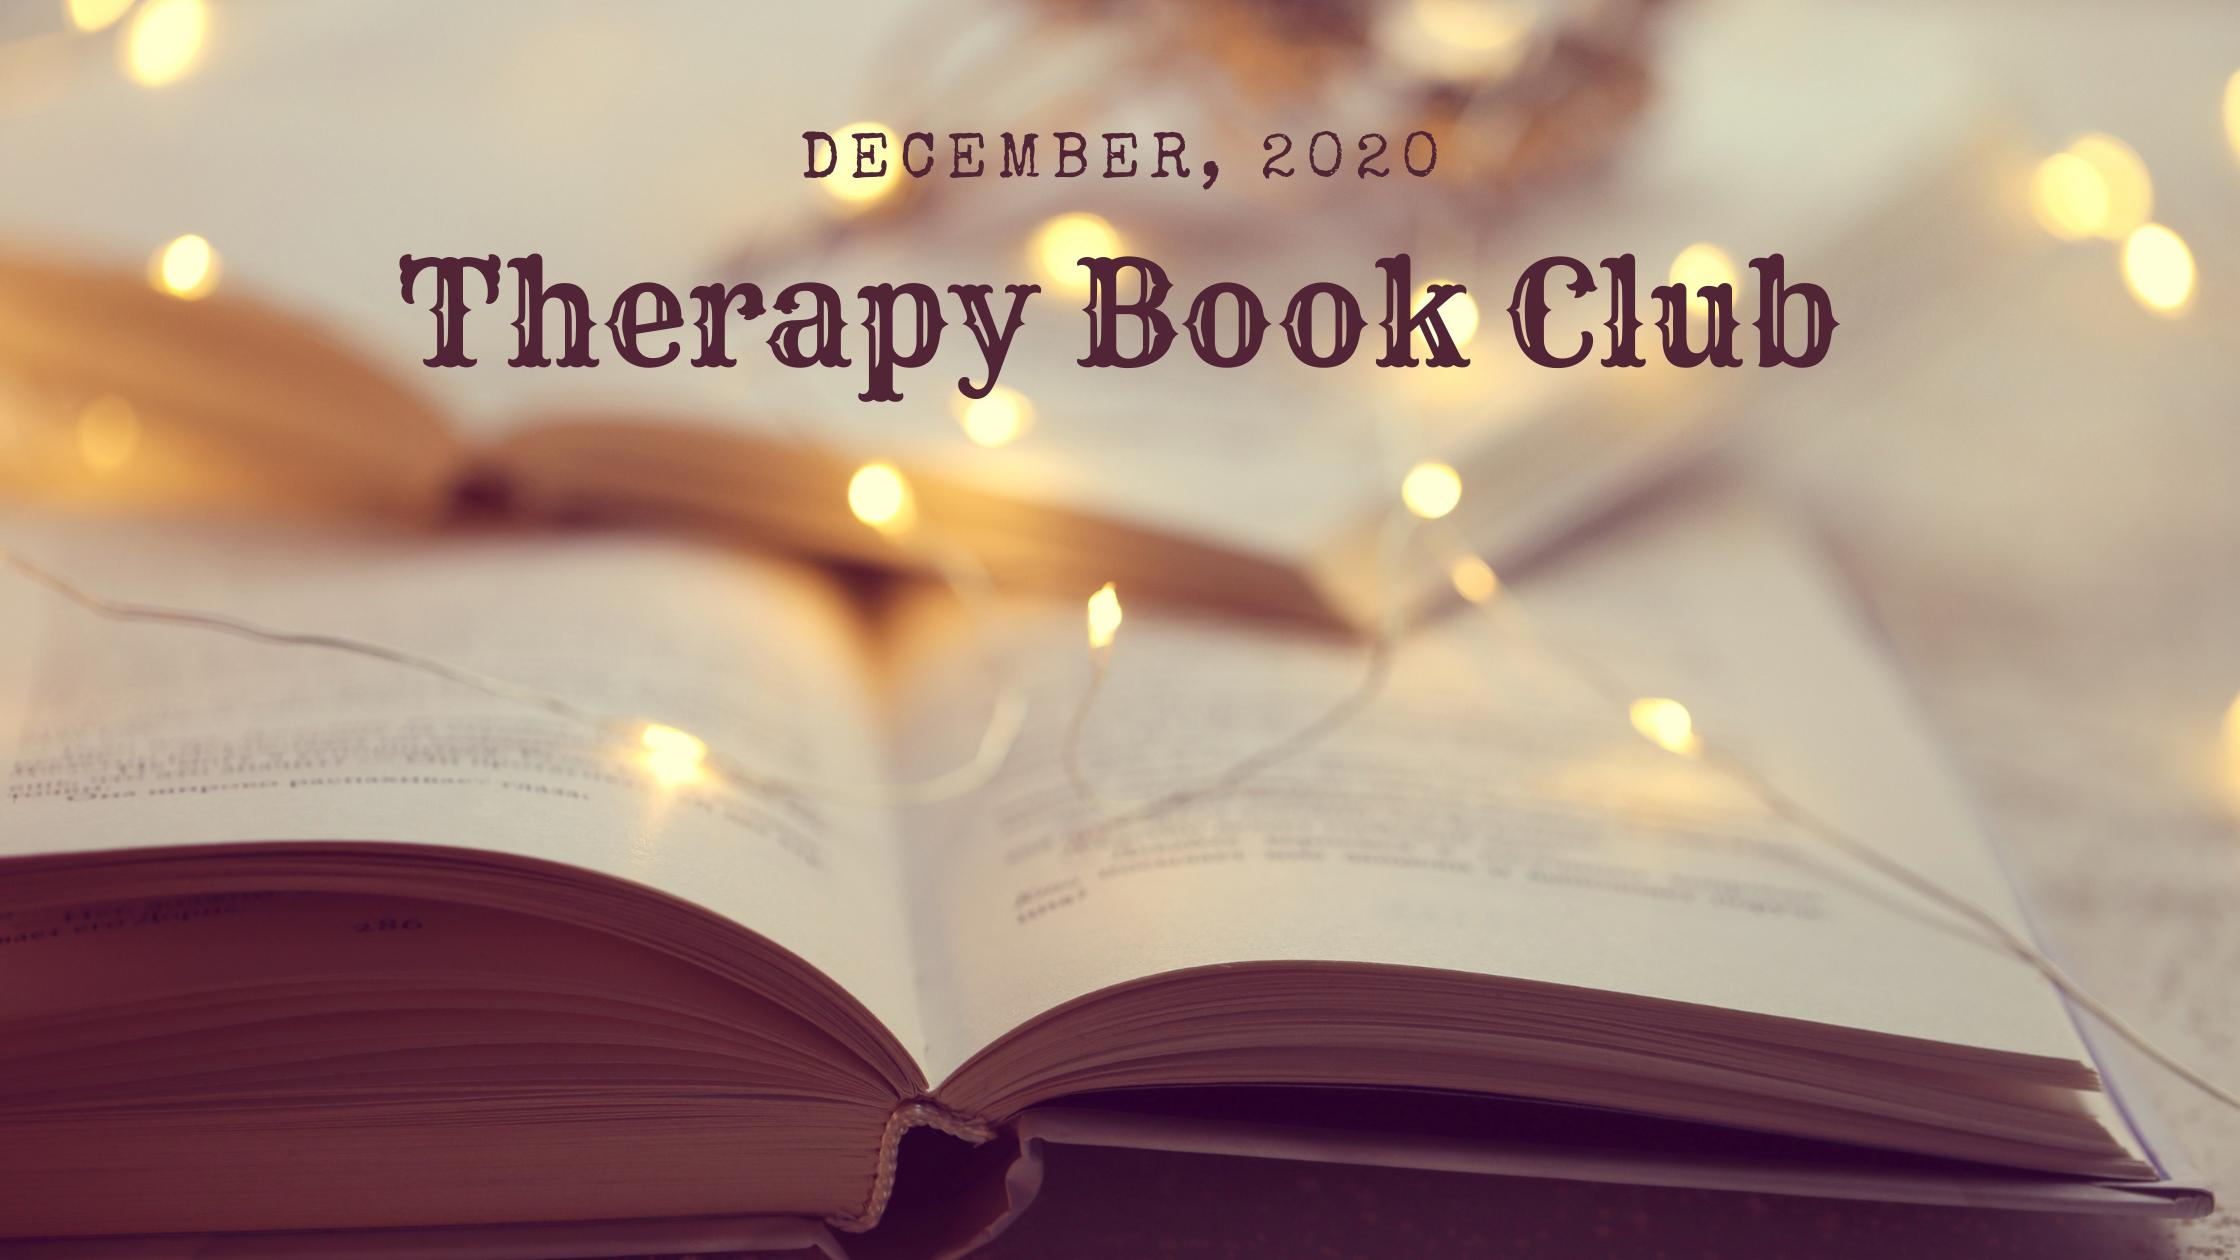 December, 2020 Therapist Book Club